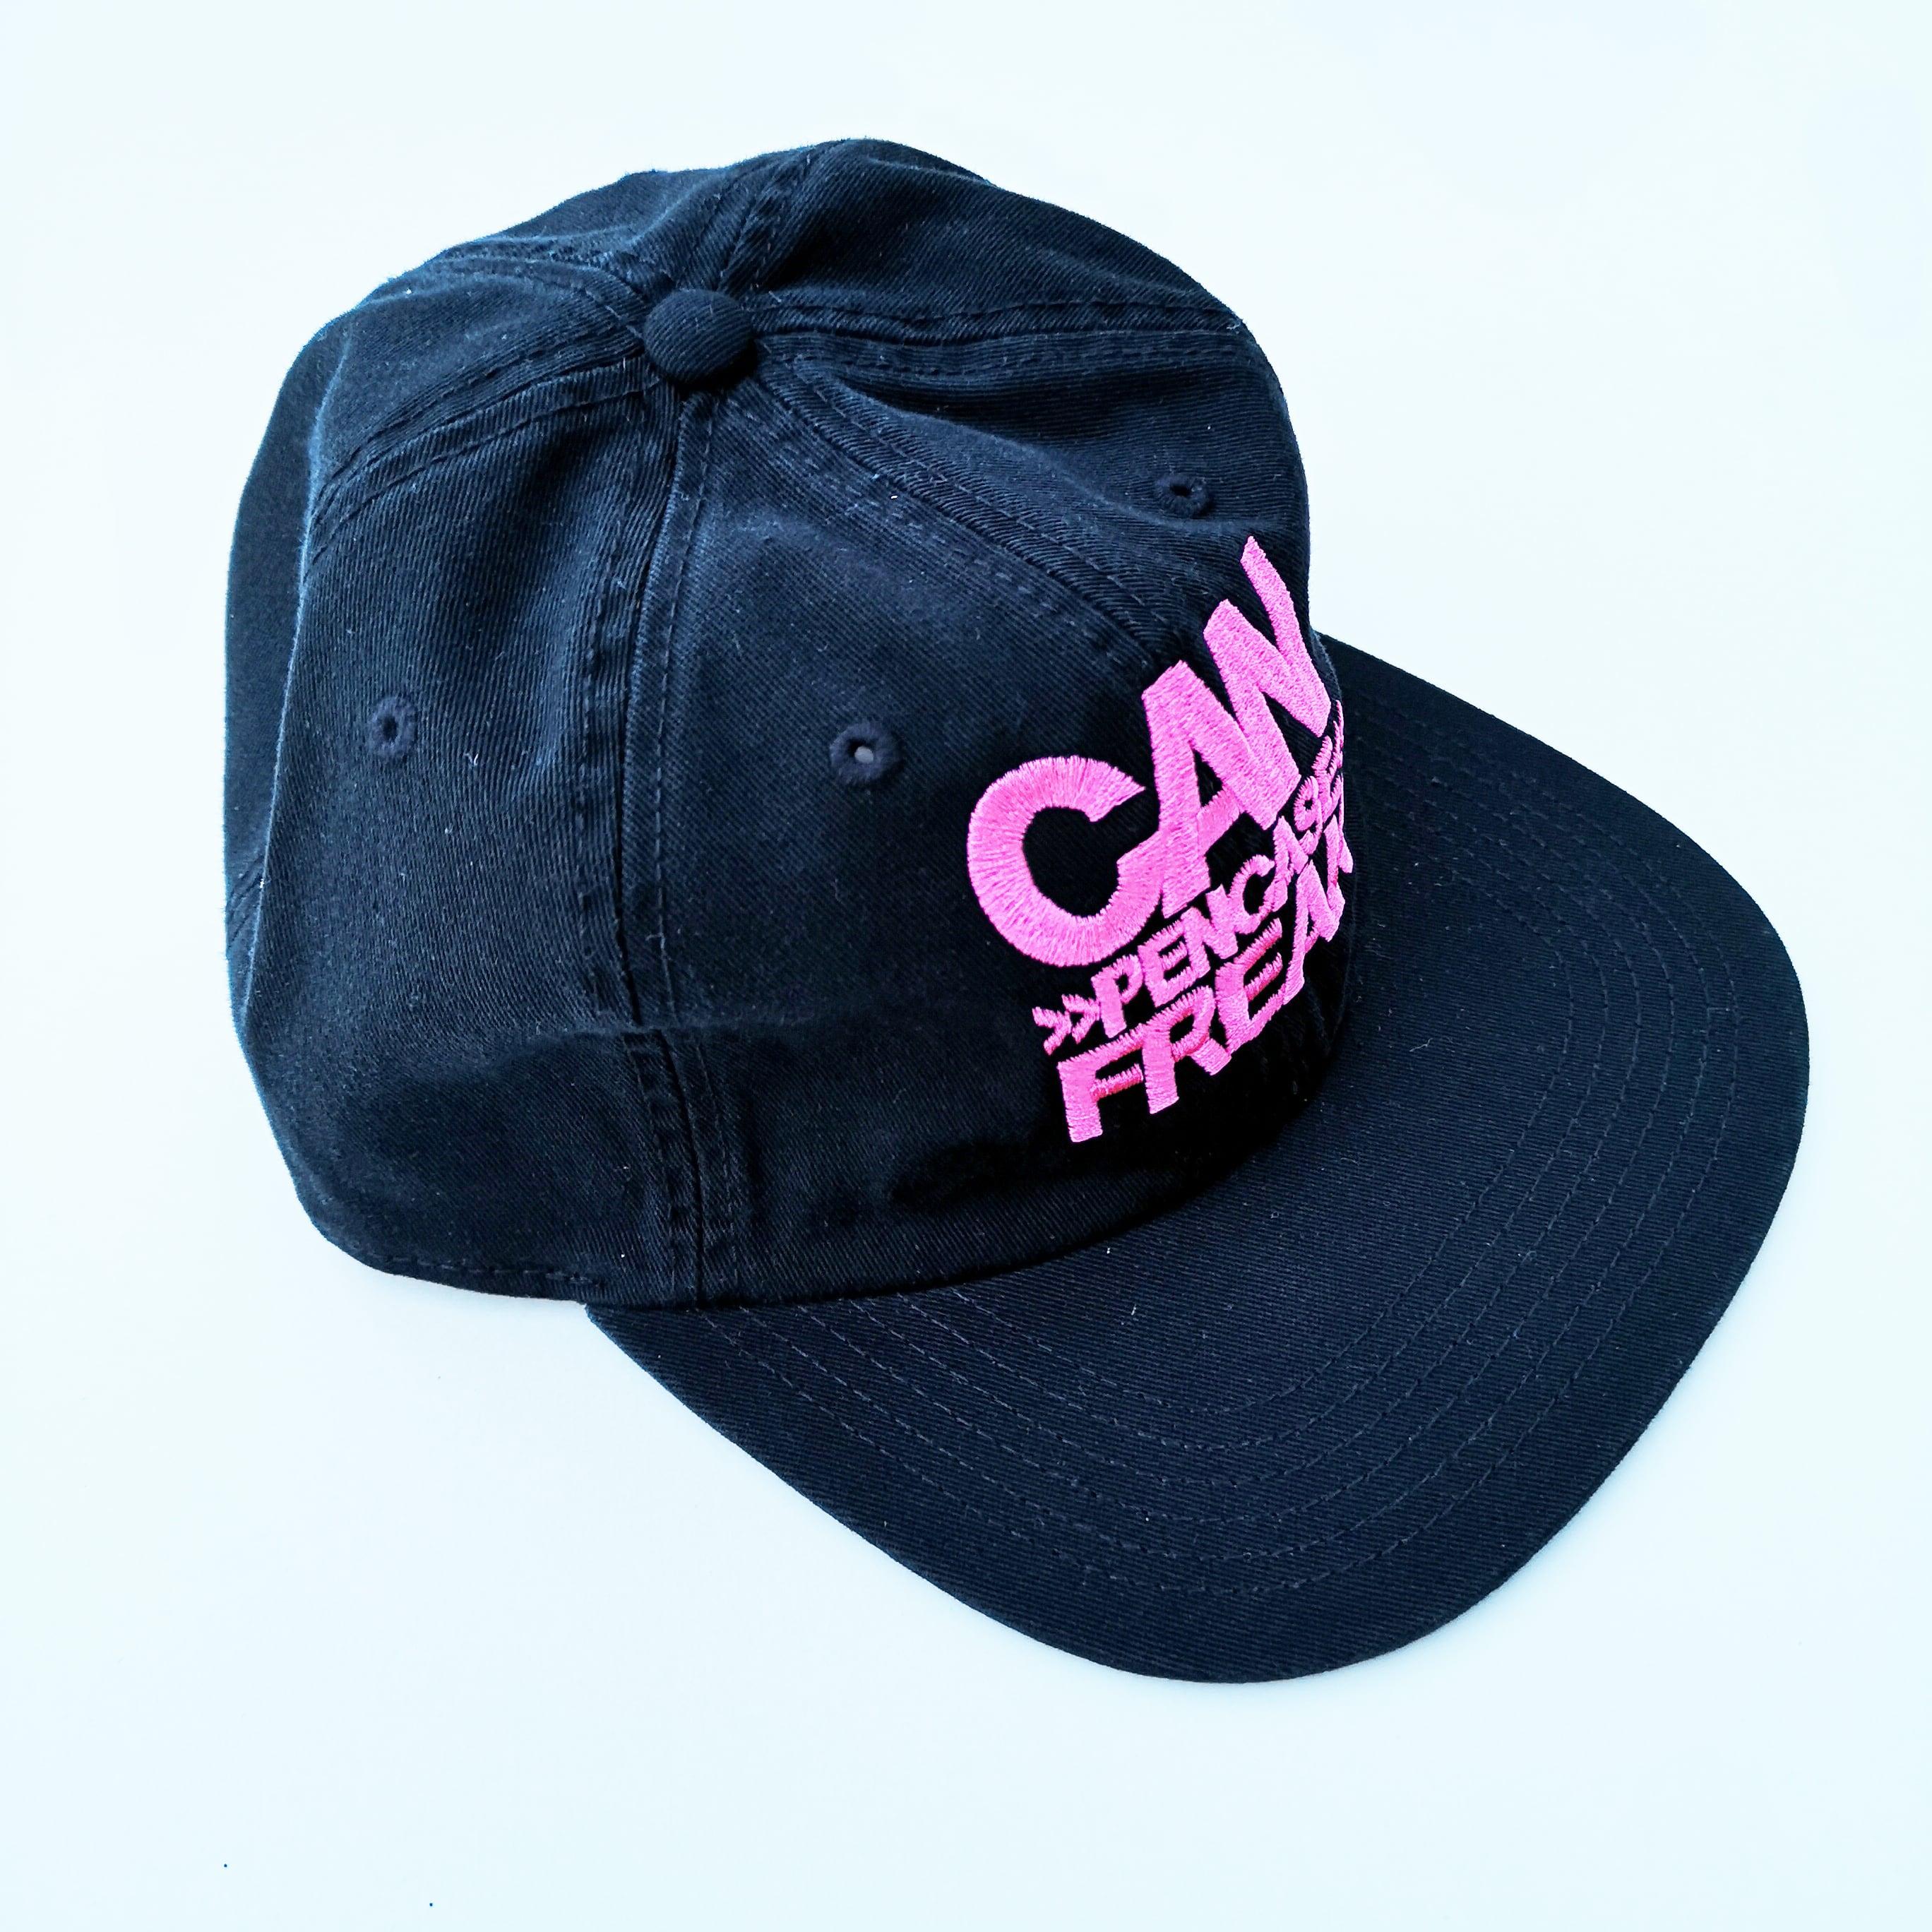 CAN PENCASE FREAK CAP + MINI POSTER